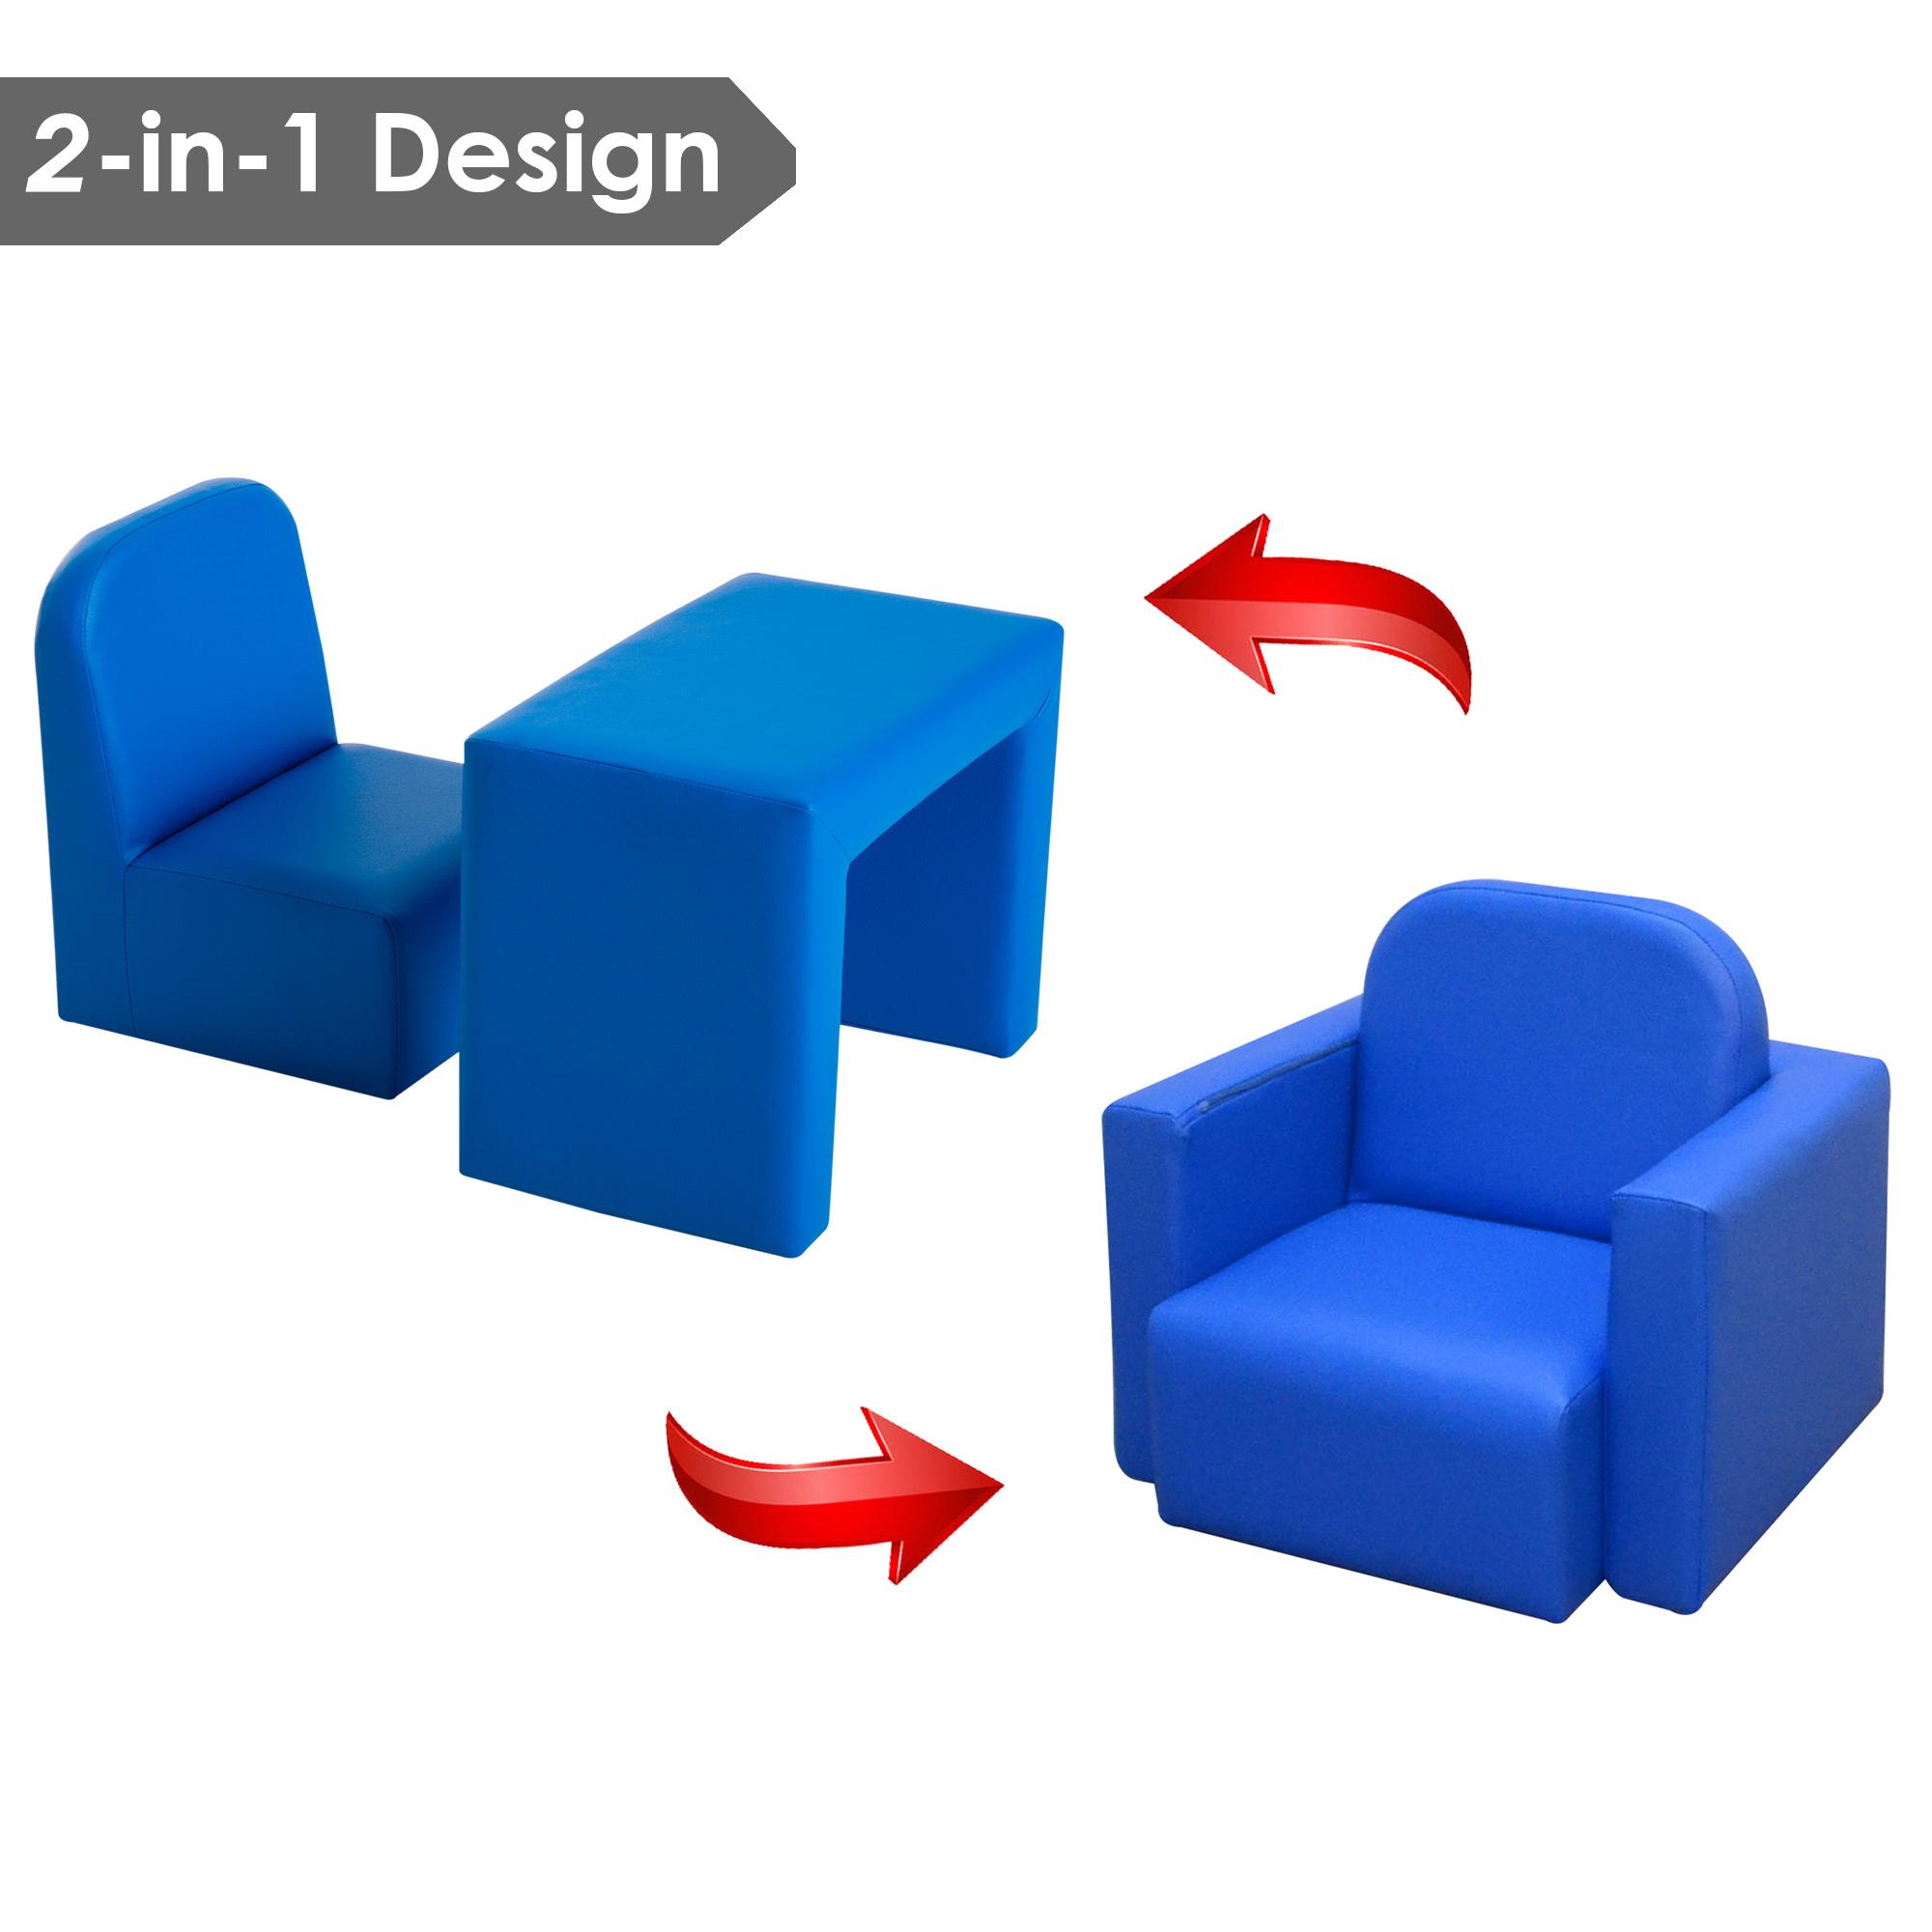 fbd54b3c149 Kids Mini Sofa 3 In 1 Table Chair Set Armchair Seat Relax Children ...